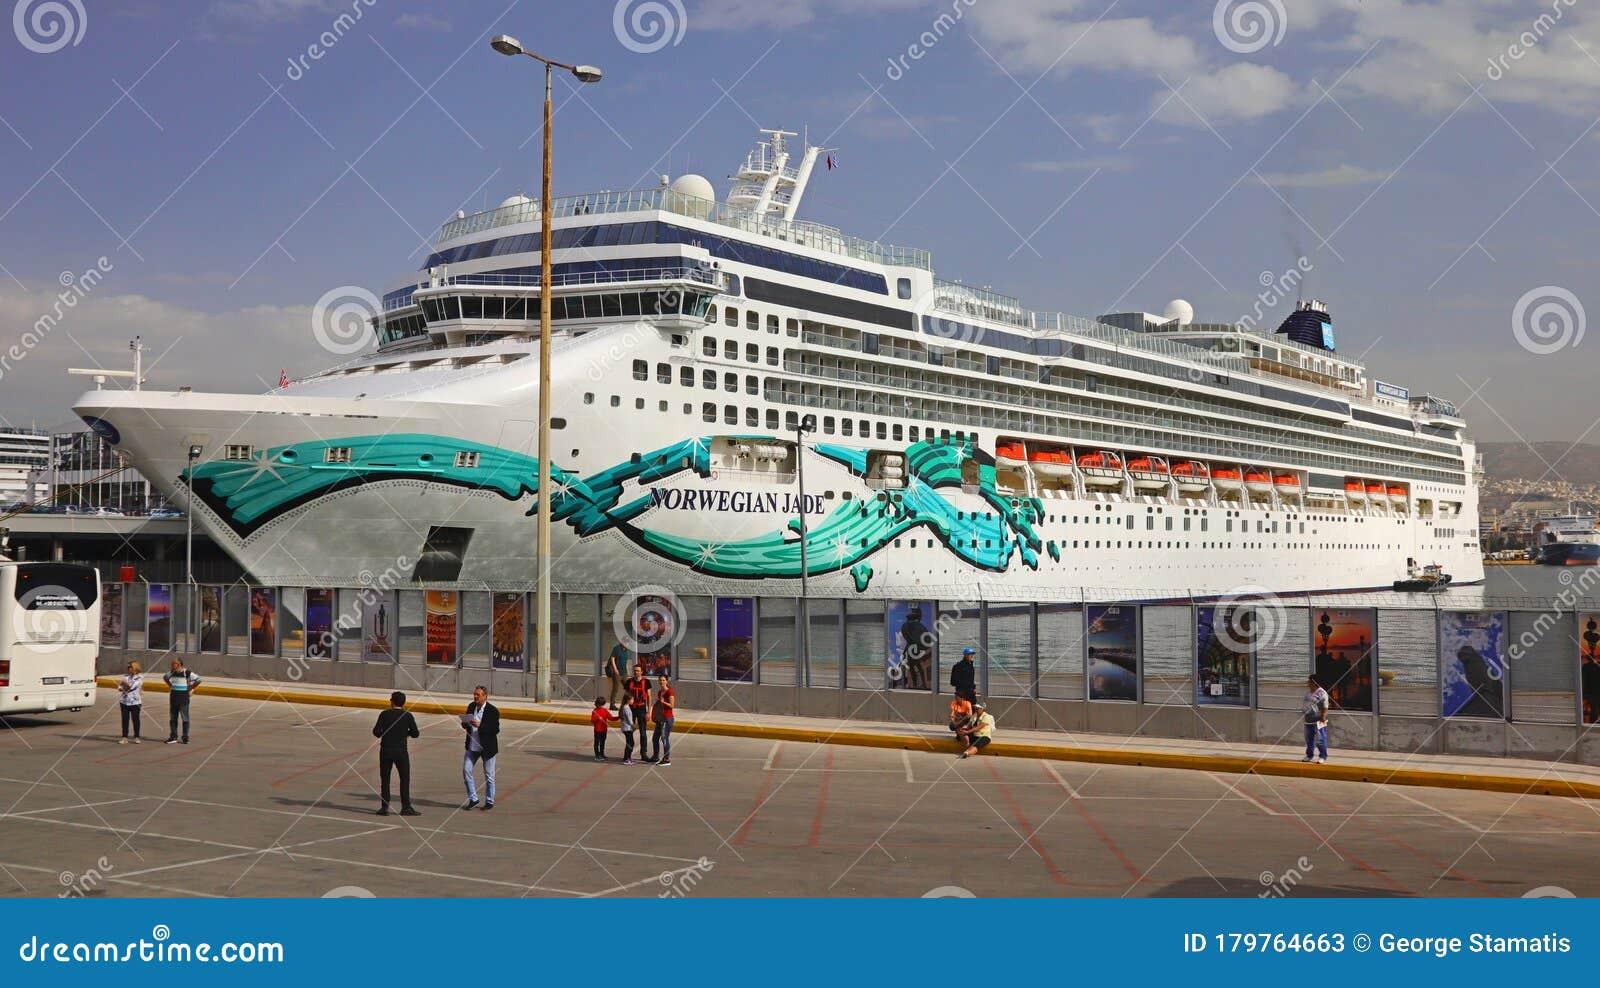 Norwegian Jade Cruise Ship Greece Editorial Stock Photo Image Of Line Port 179764663